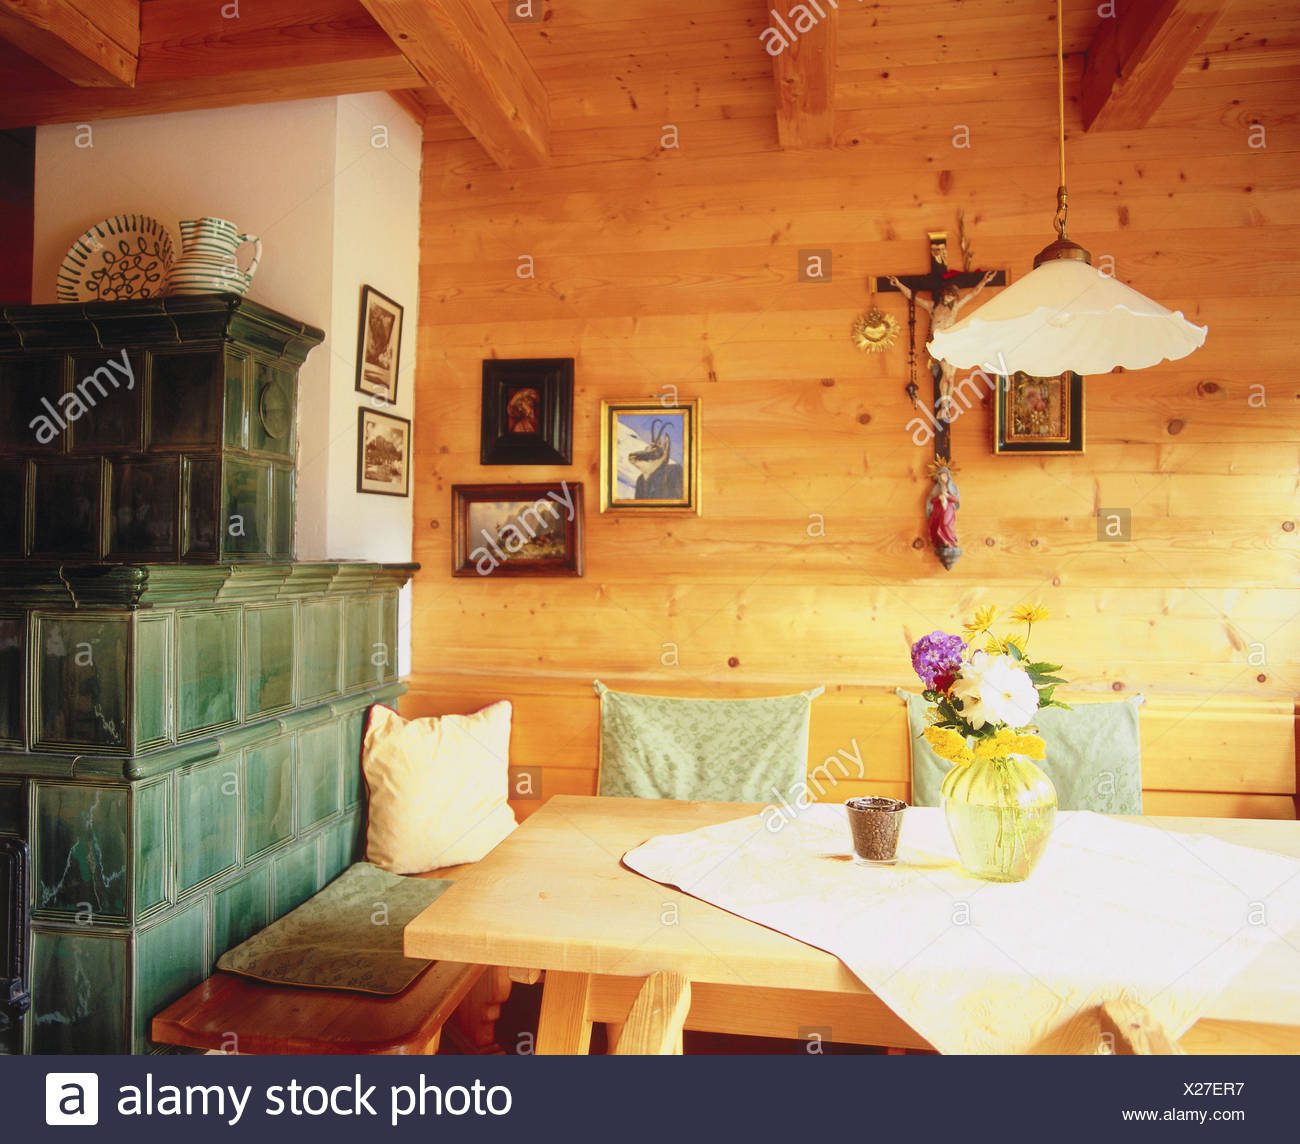 Kche Holz Rustikal 5 Zimmer Kche Sarg Besetzung Kleine